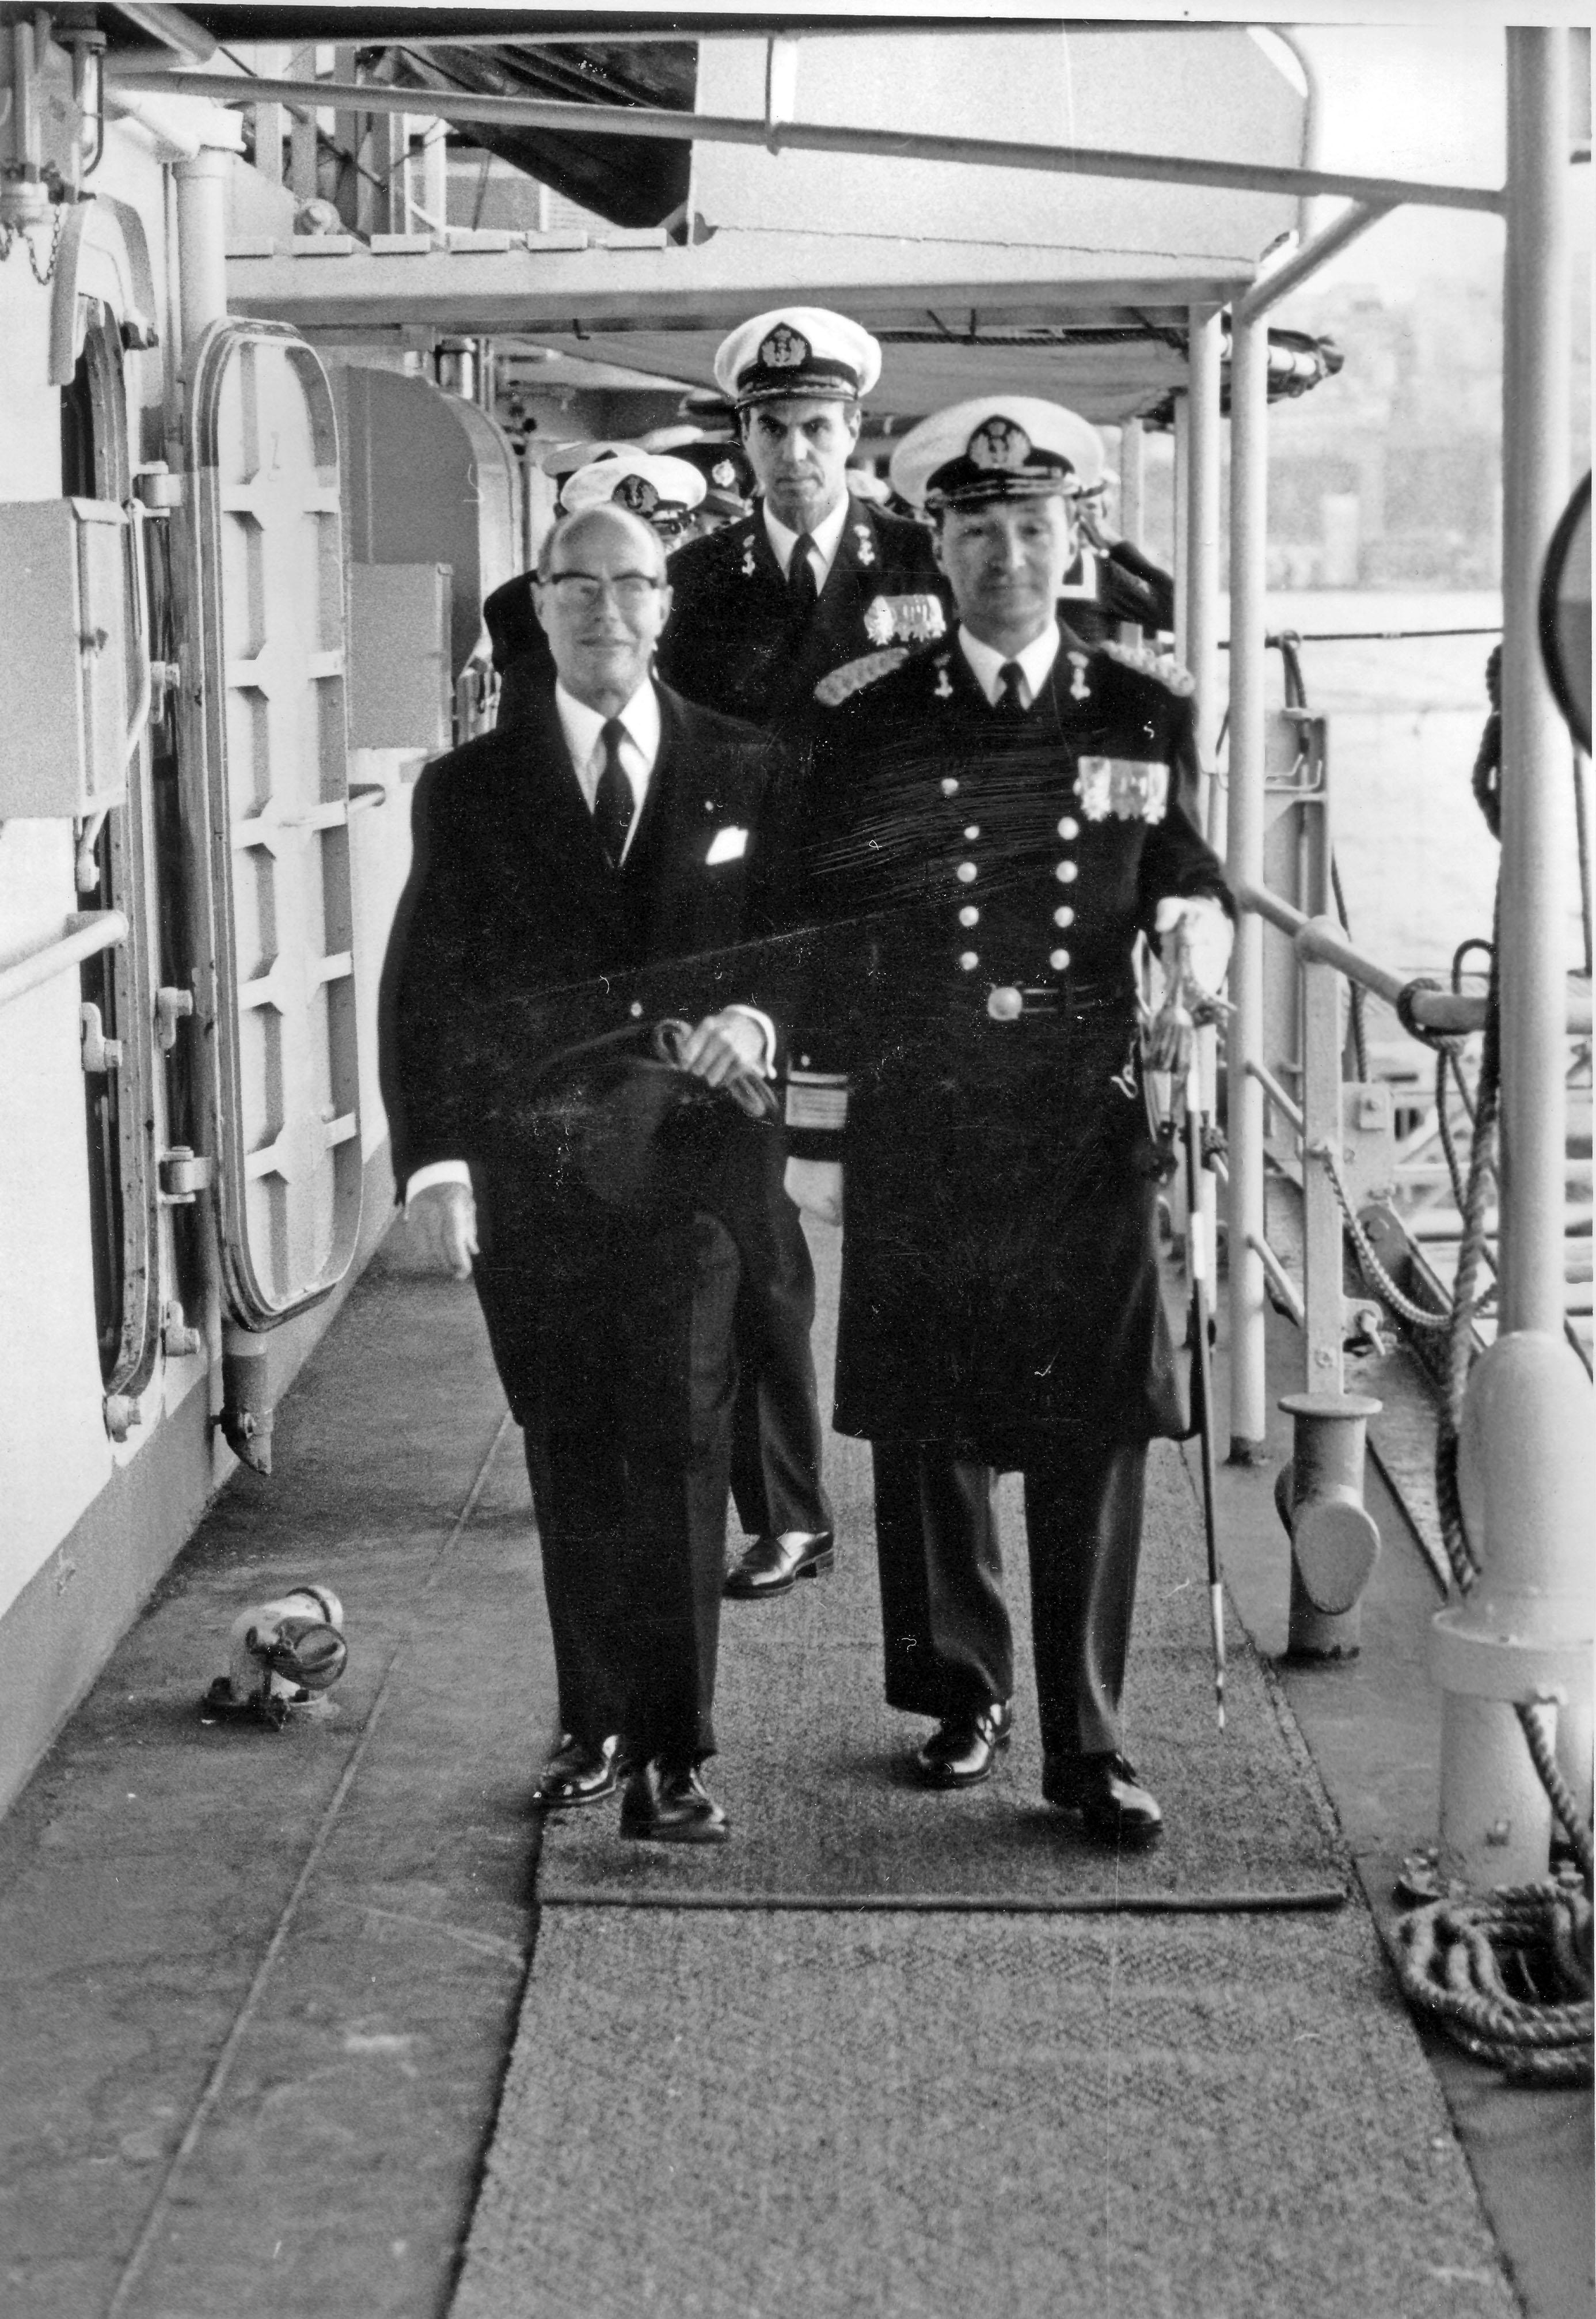 Vlootbezoek 1973